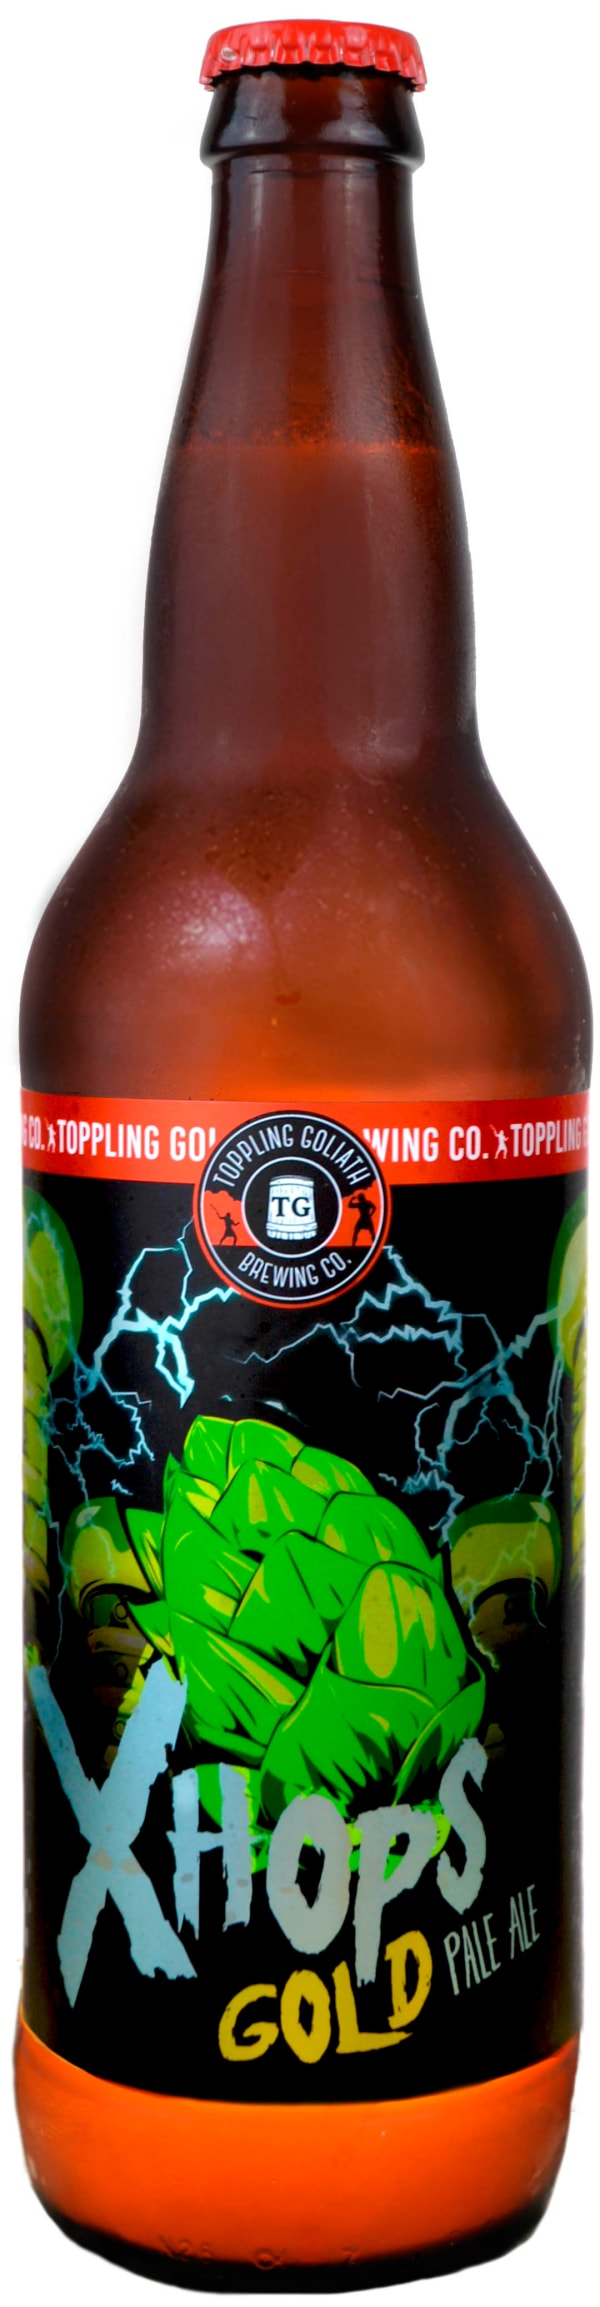 Toppling Golliath Xhops Gold Pale Ale